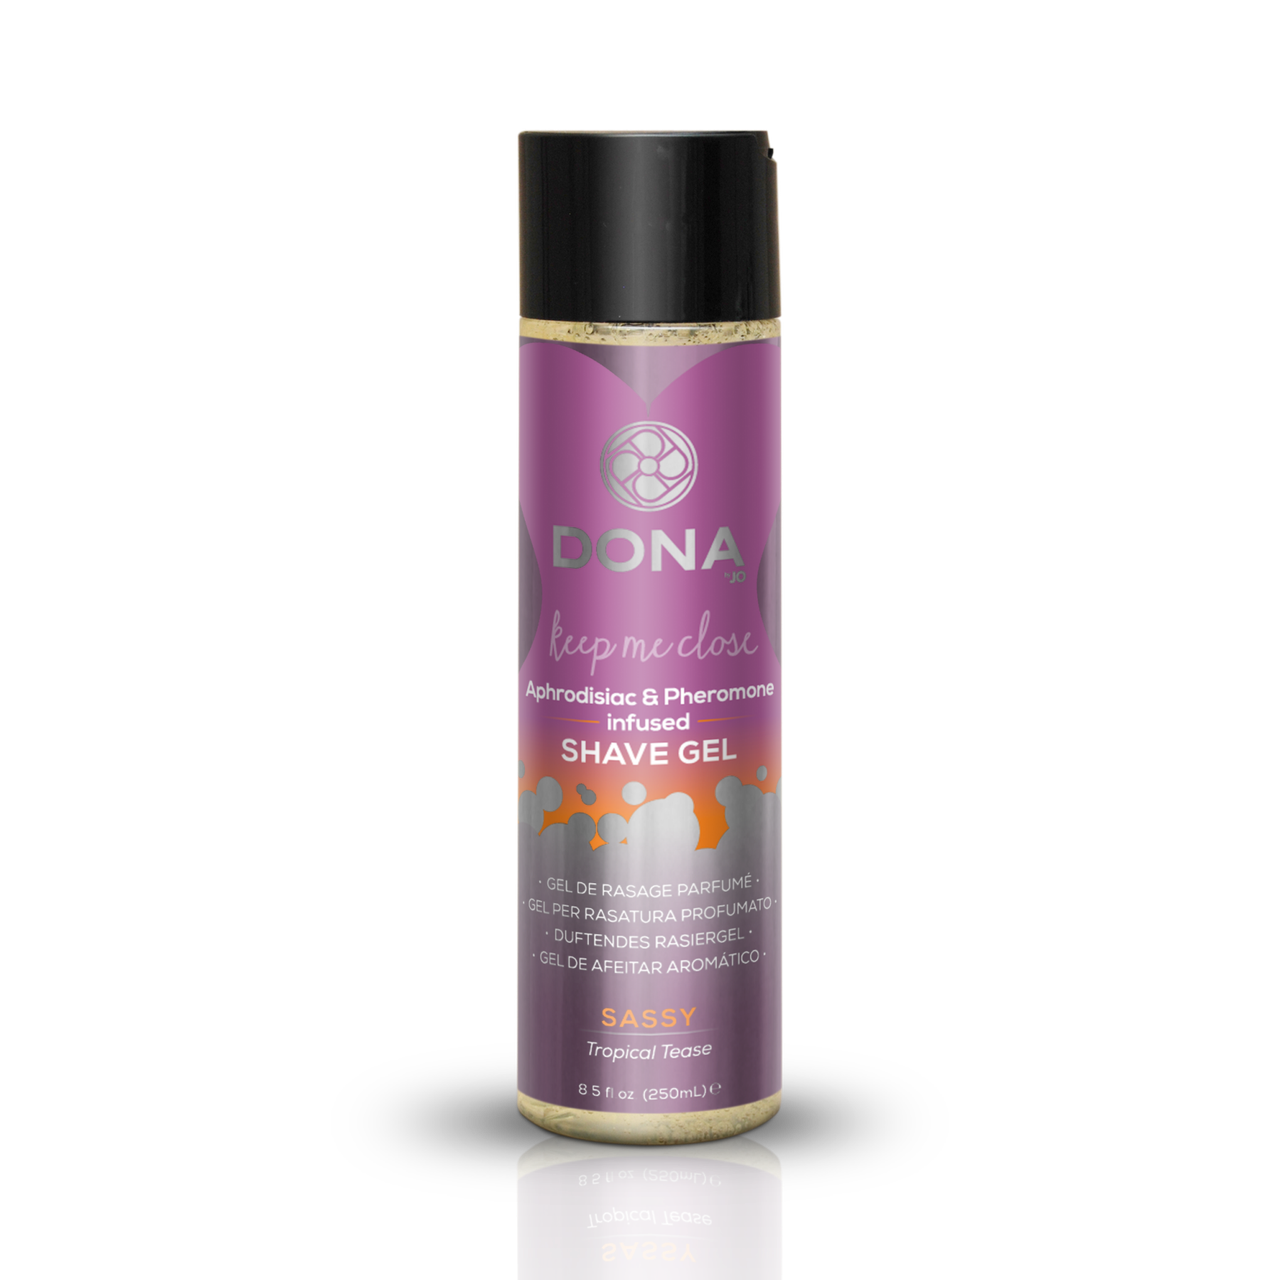 Гель для бритья DONA Intimate Shave Gel: Sassy Tropical Tease (250 мл) с феромонами и афродизиаками SO2098